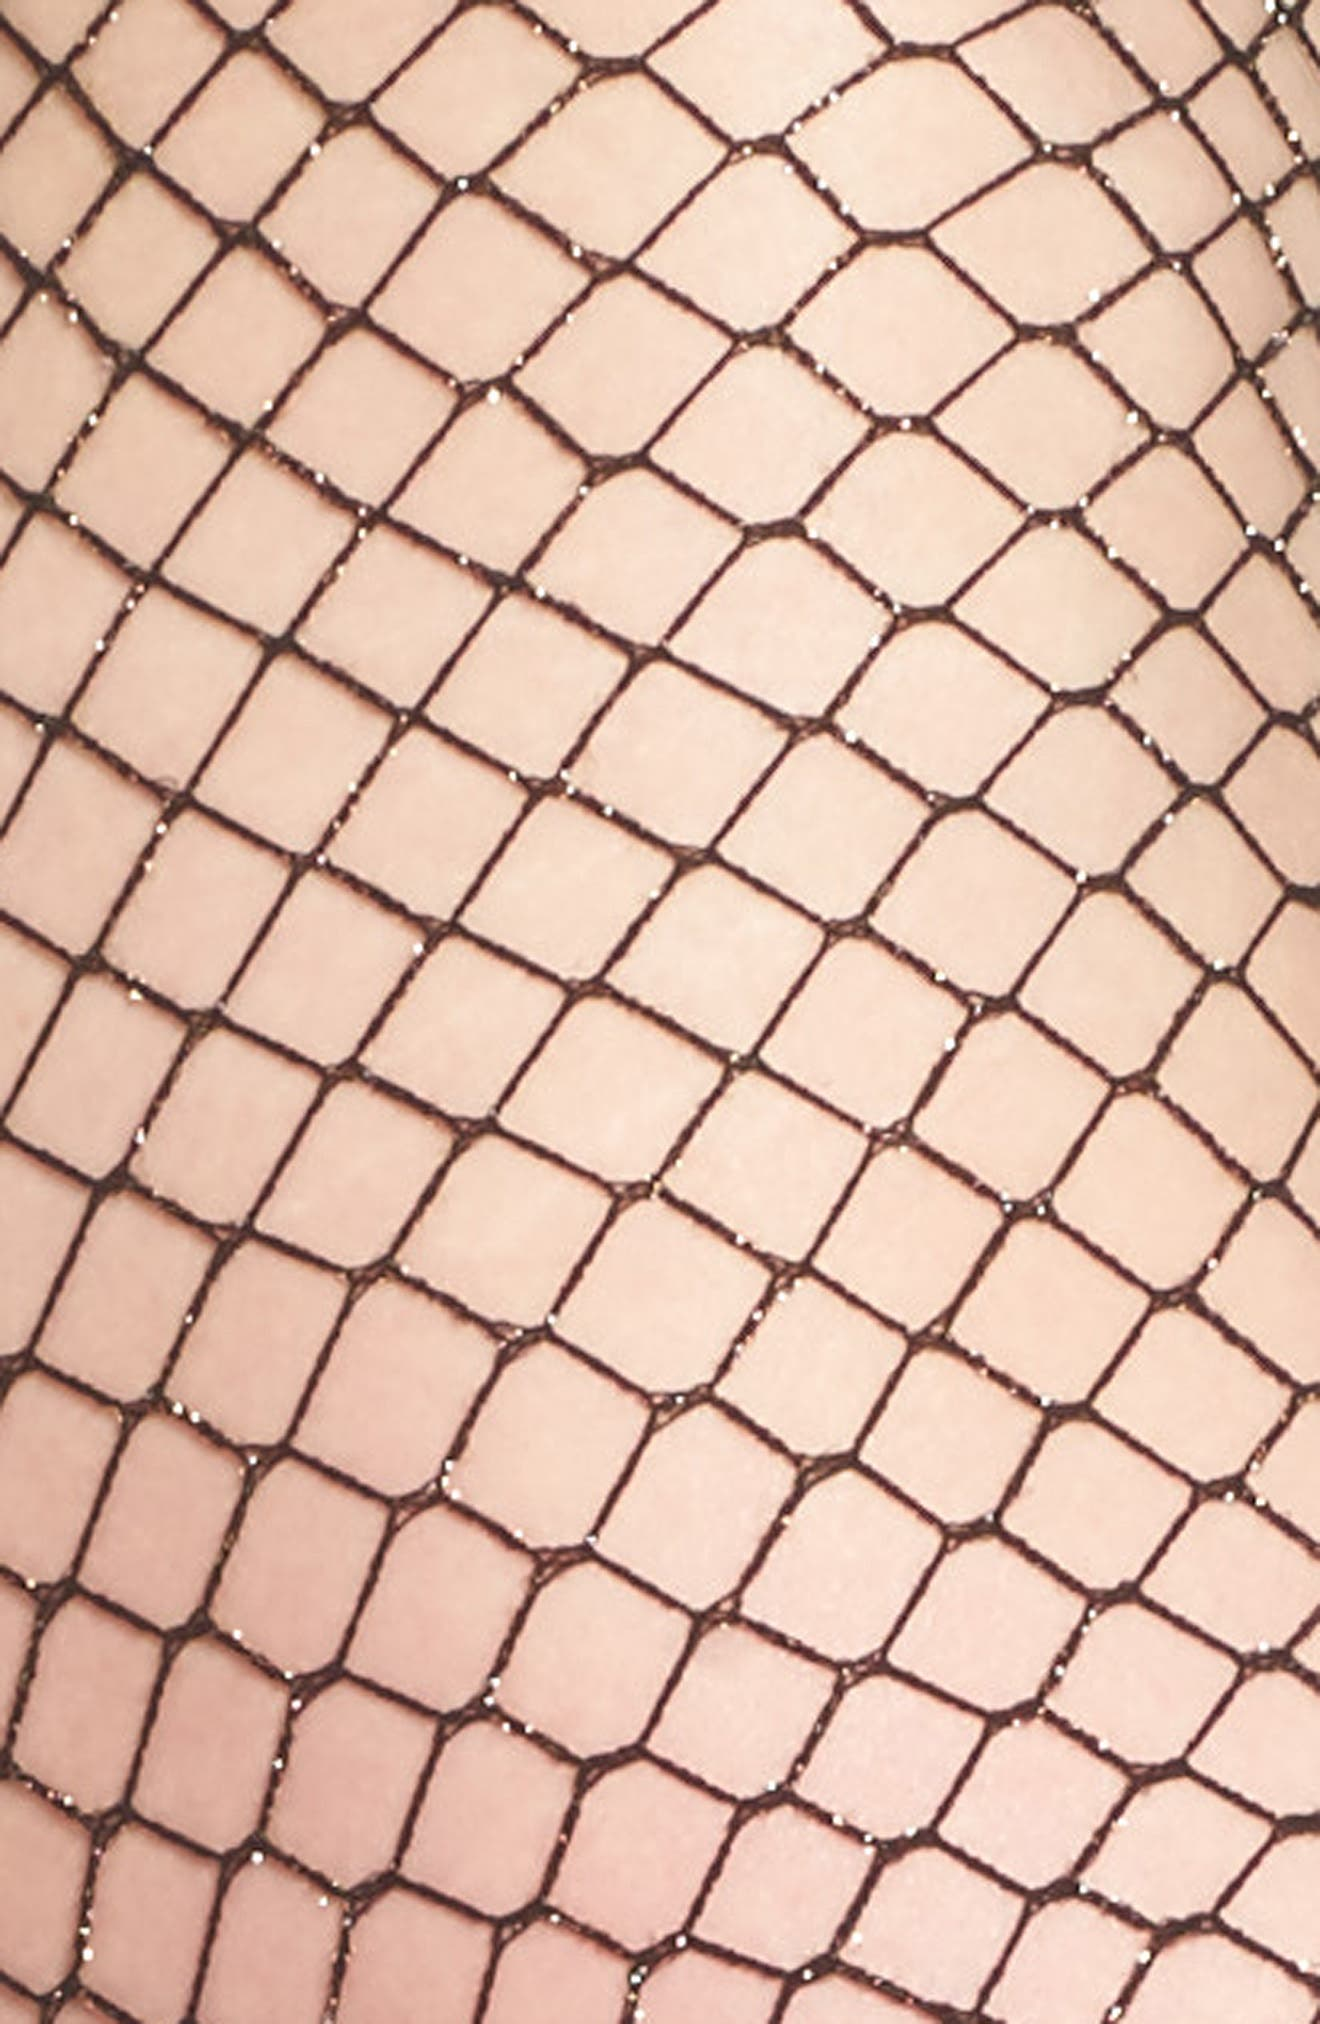 Sparkle Fishnet Tights,                             Alternate thumbnail 2, color,                             Black